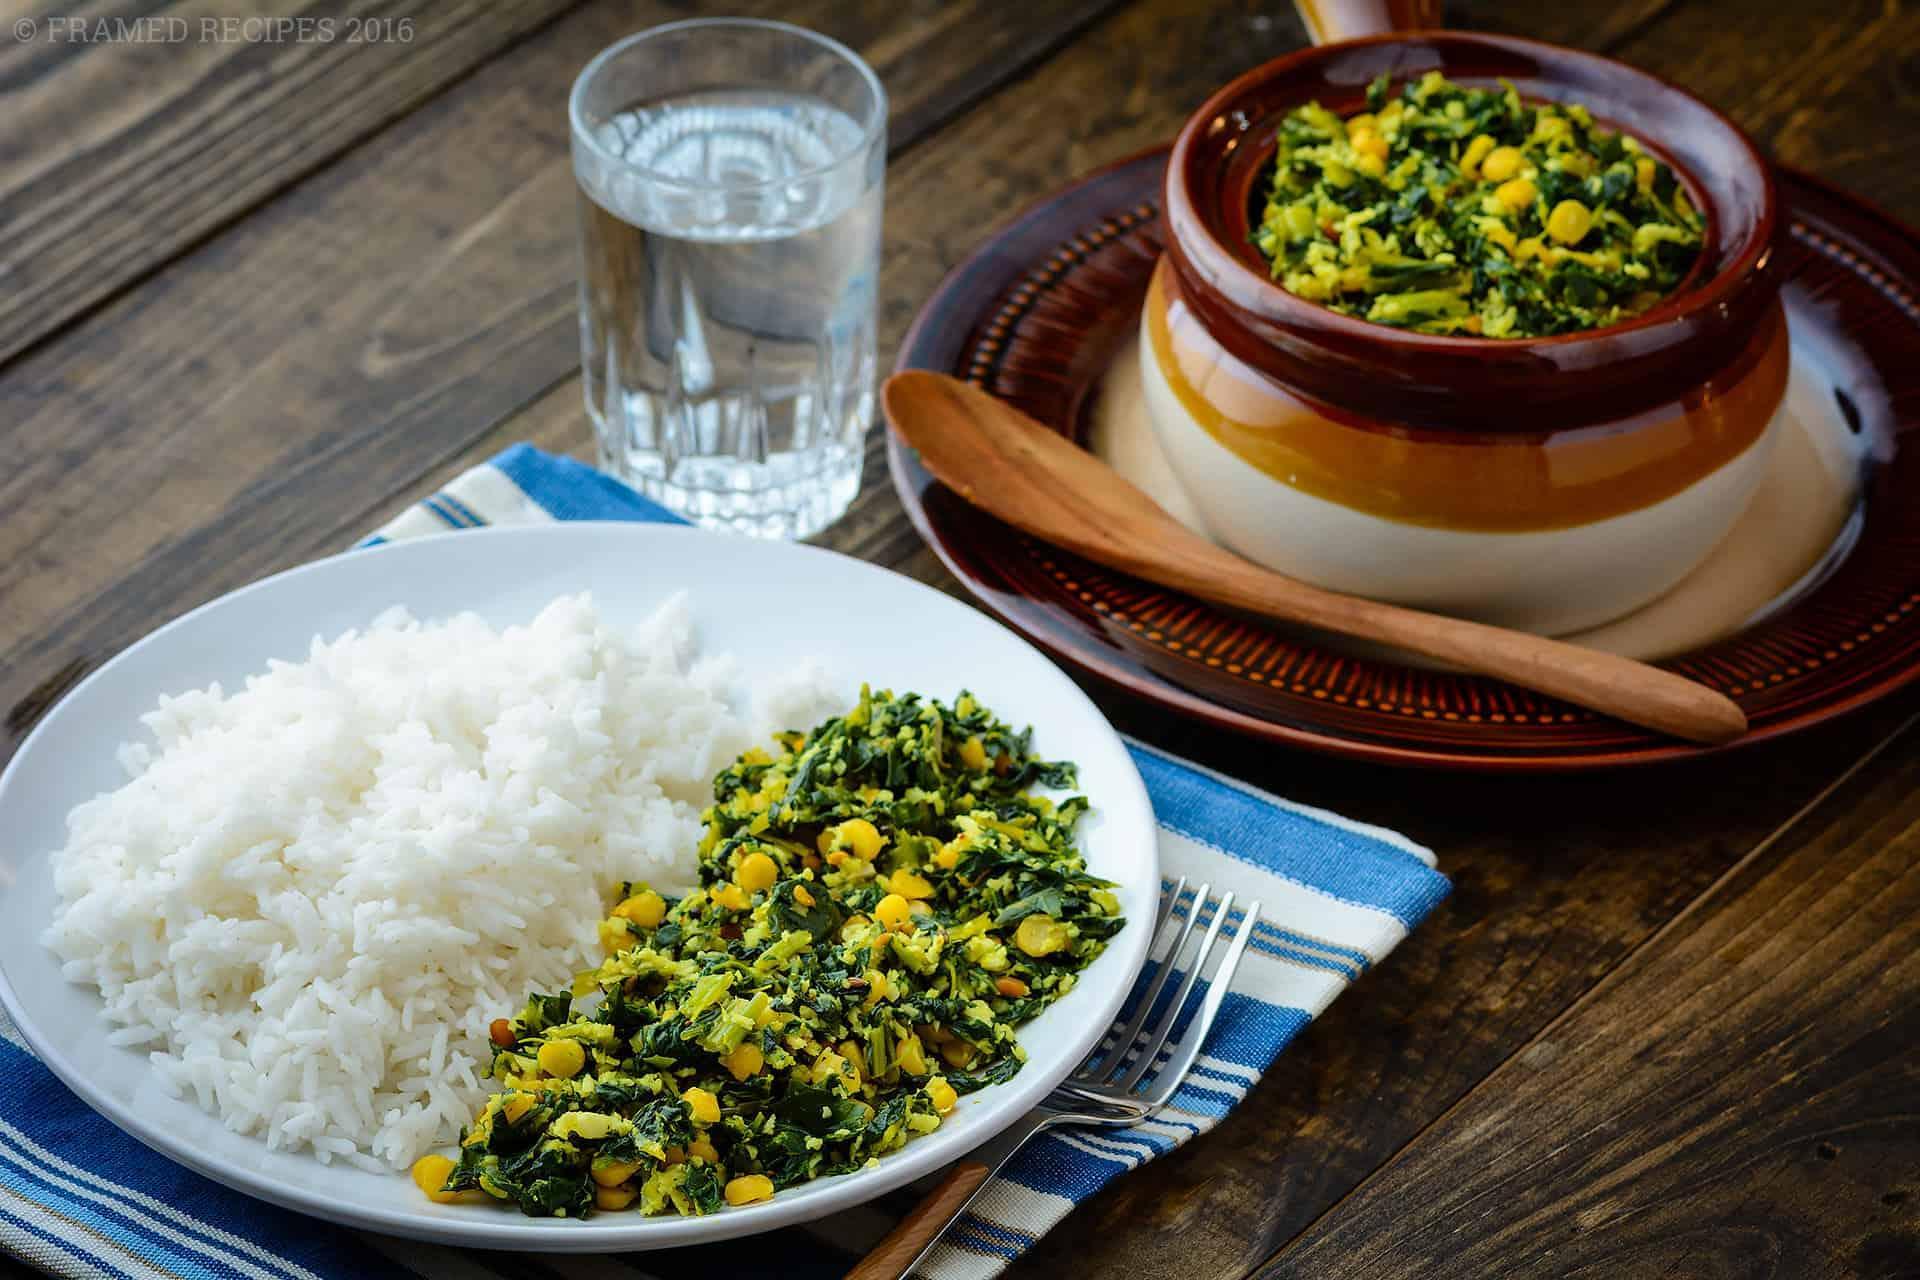 mustard_greens_with_chana_dal_stir_fry_dsc1028